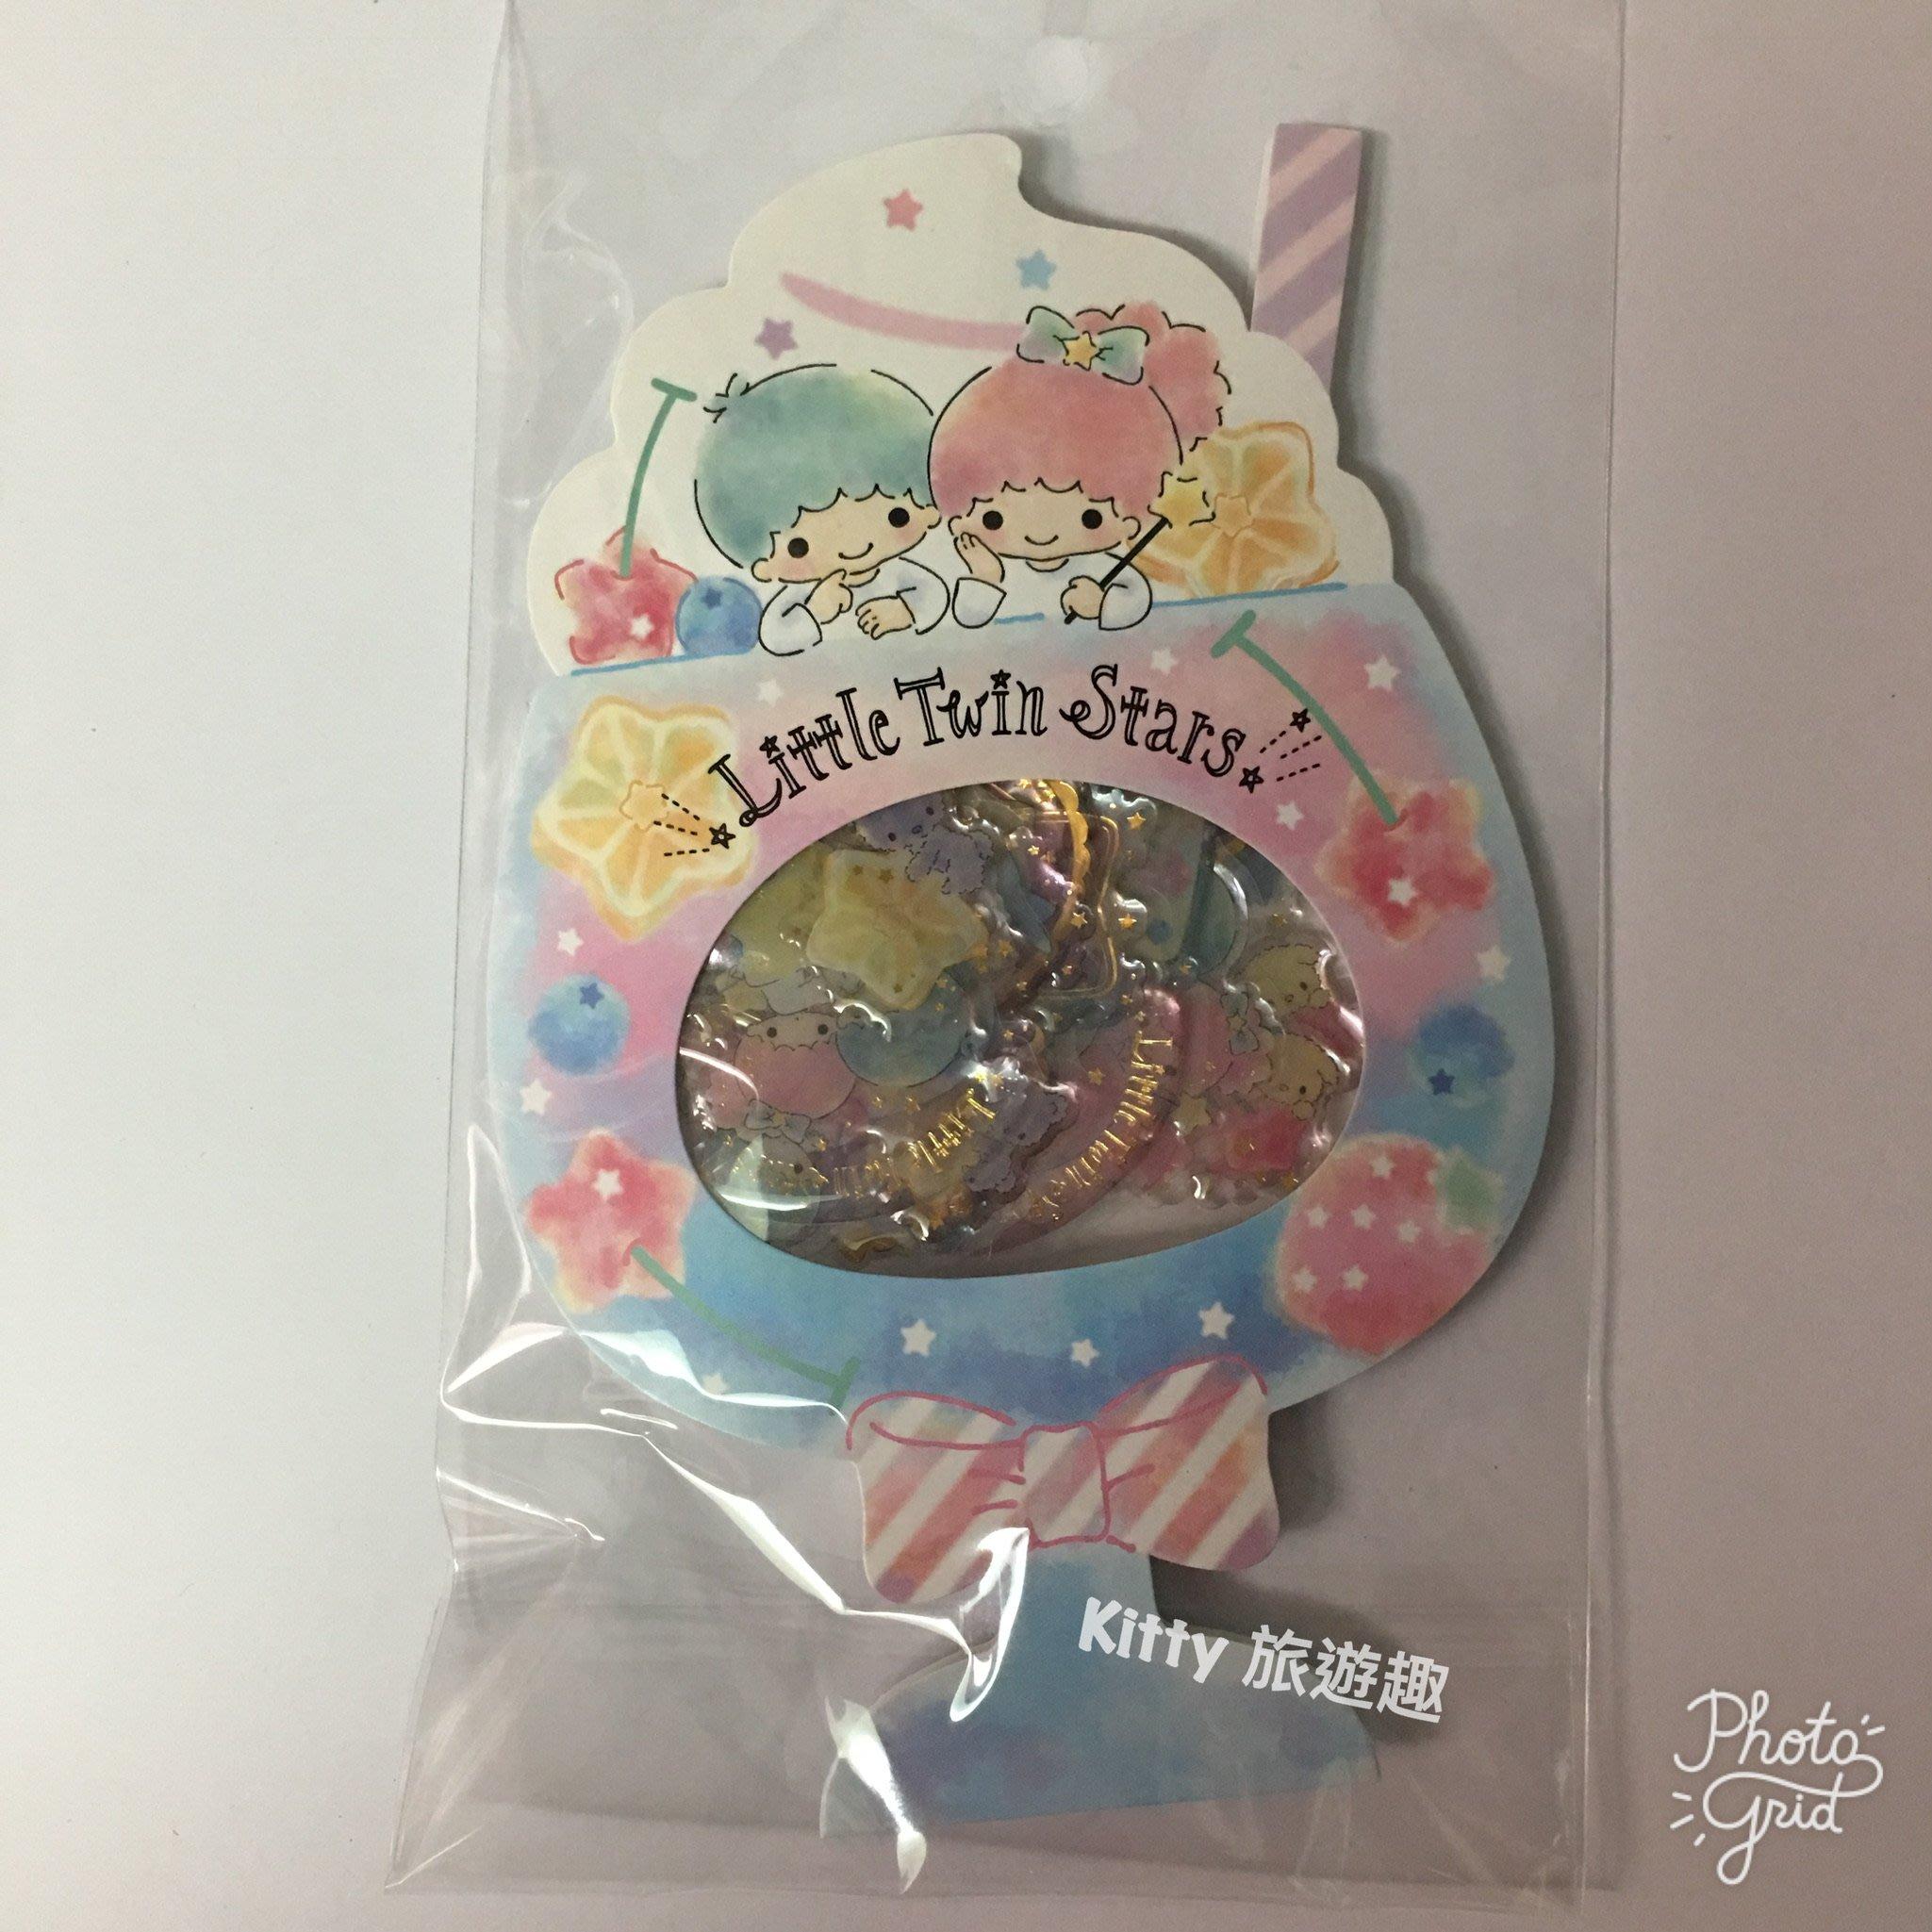 [Kitty 旅遊趣] 新到貨 Kikilala 貼紙 造型貼紙 雙子星 大耳狗 甜點 有兩款